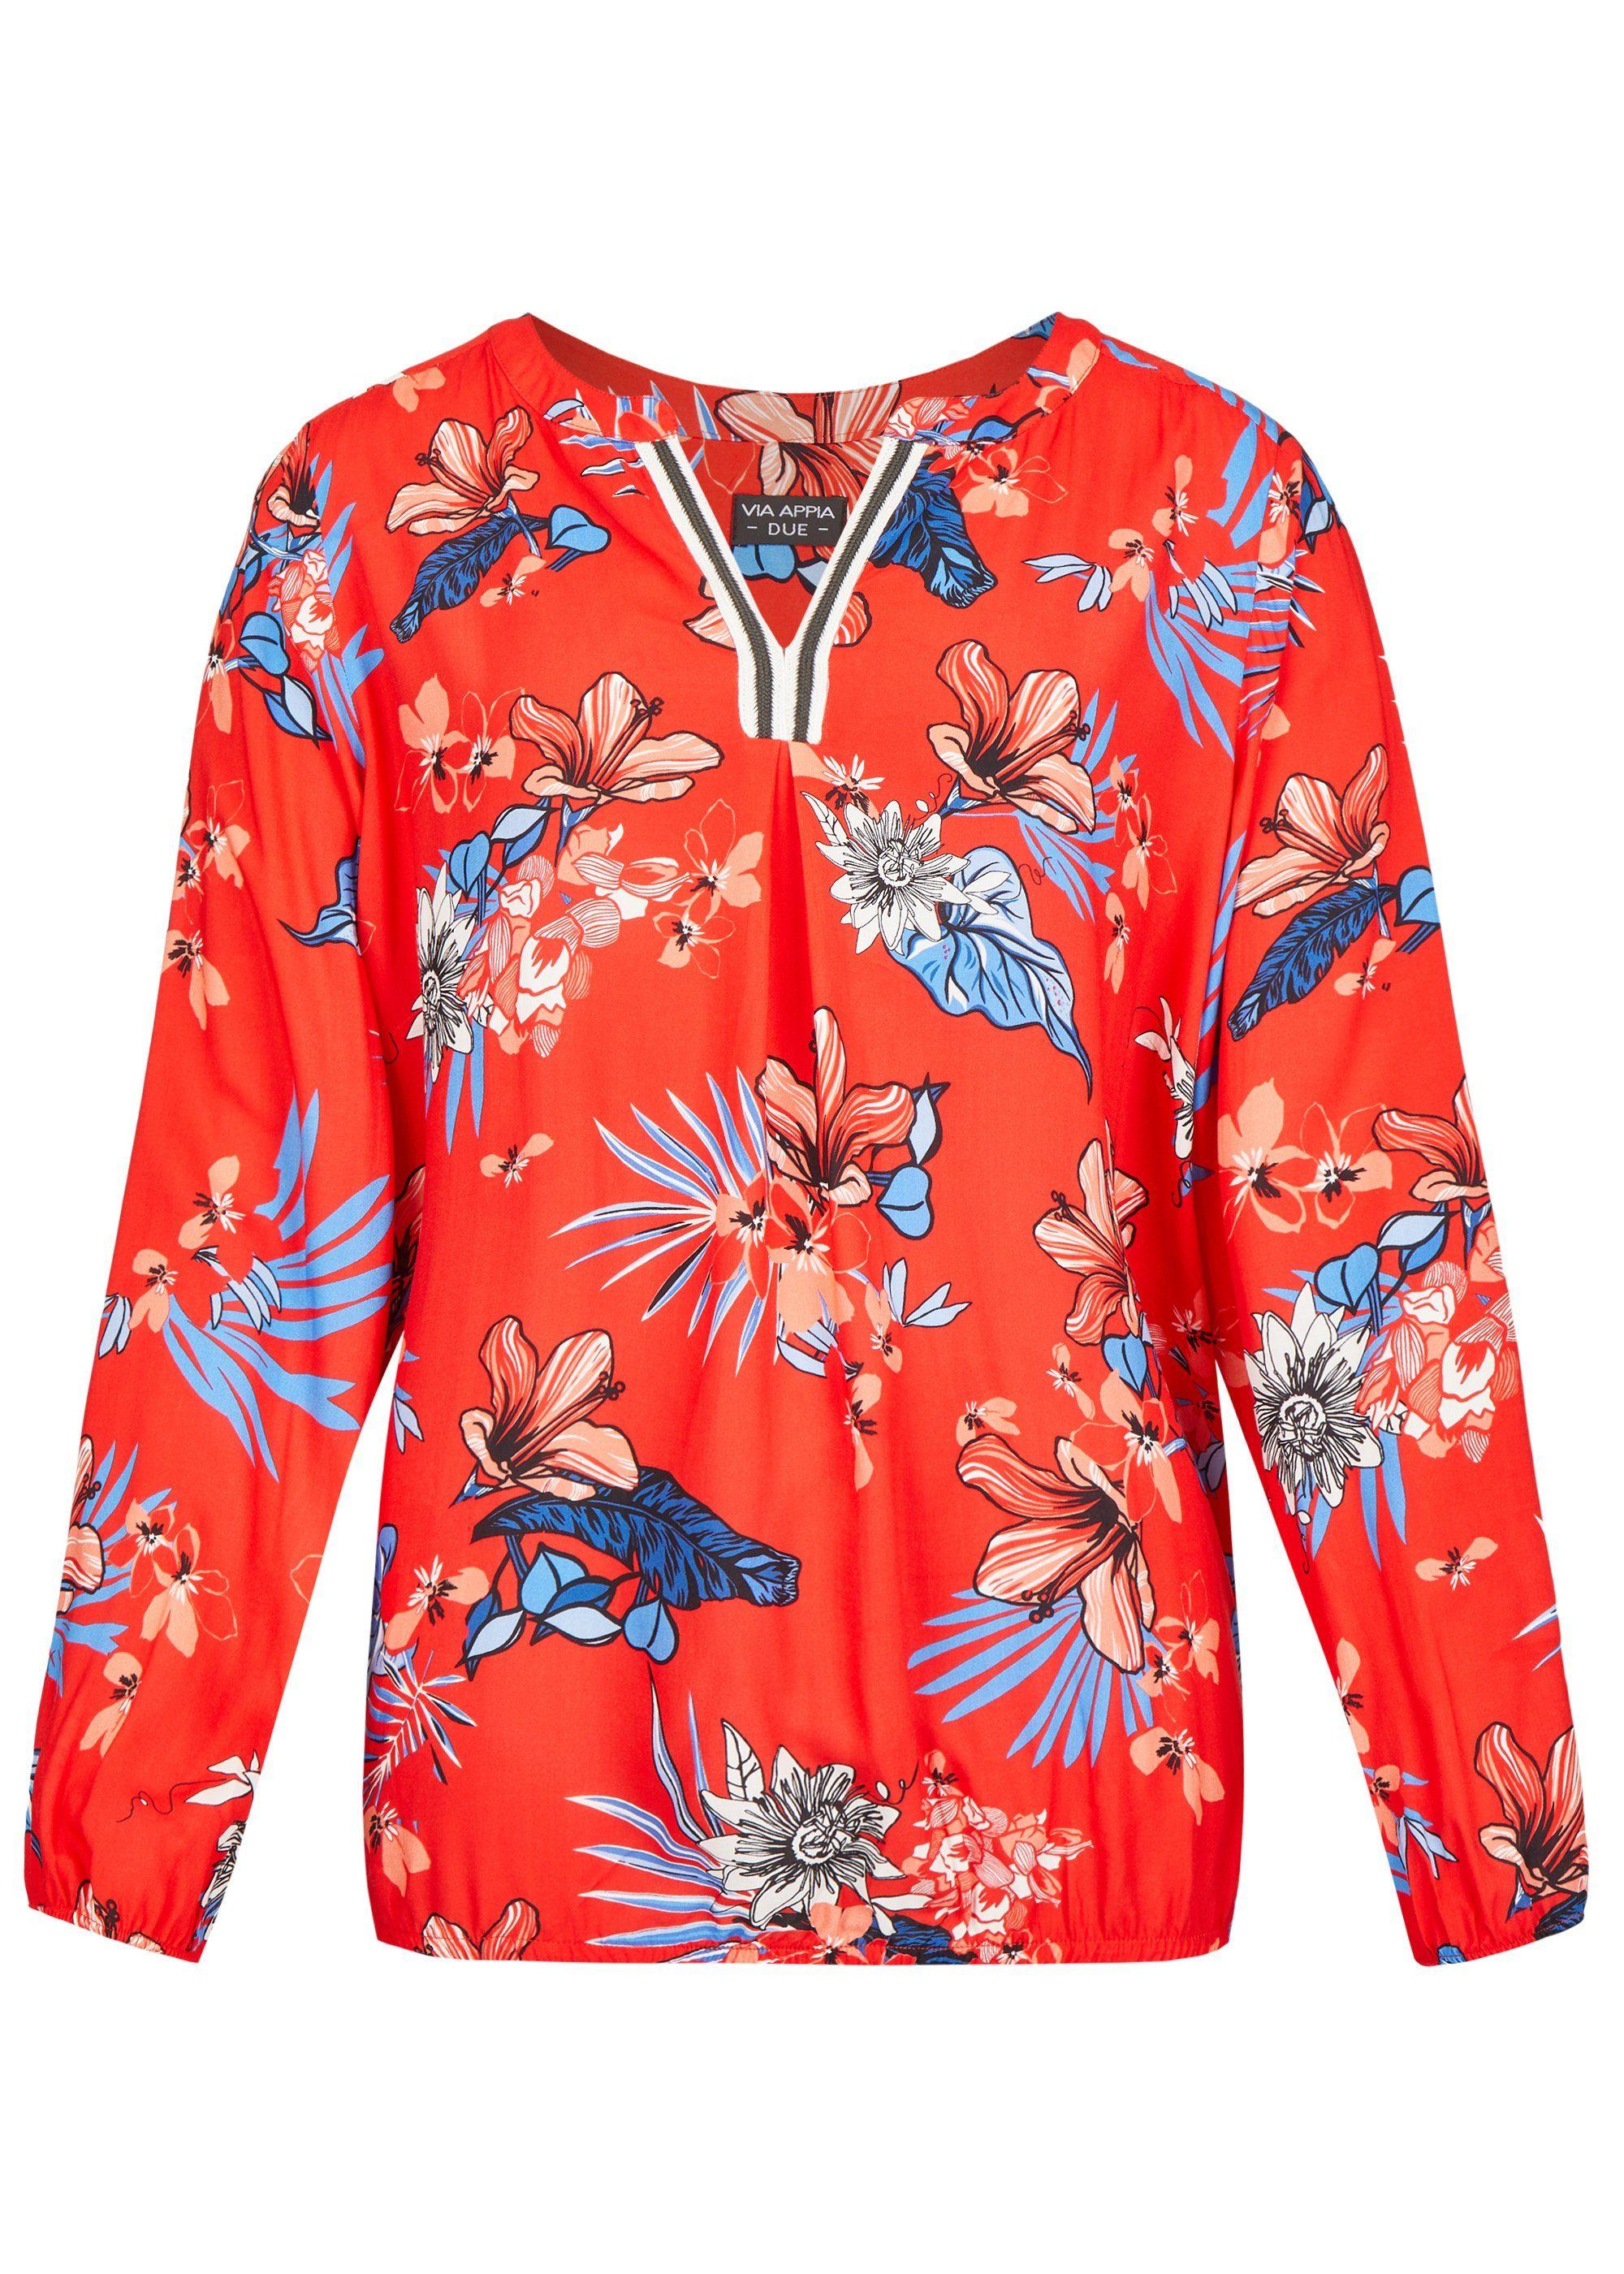 VIA APPIA DUE Romantische Bluse mit Blumen-Muster